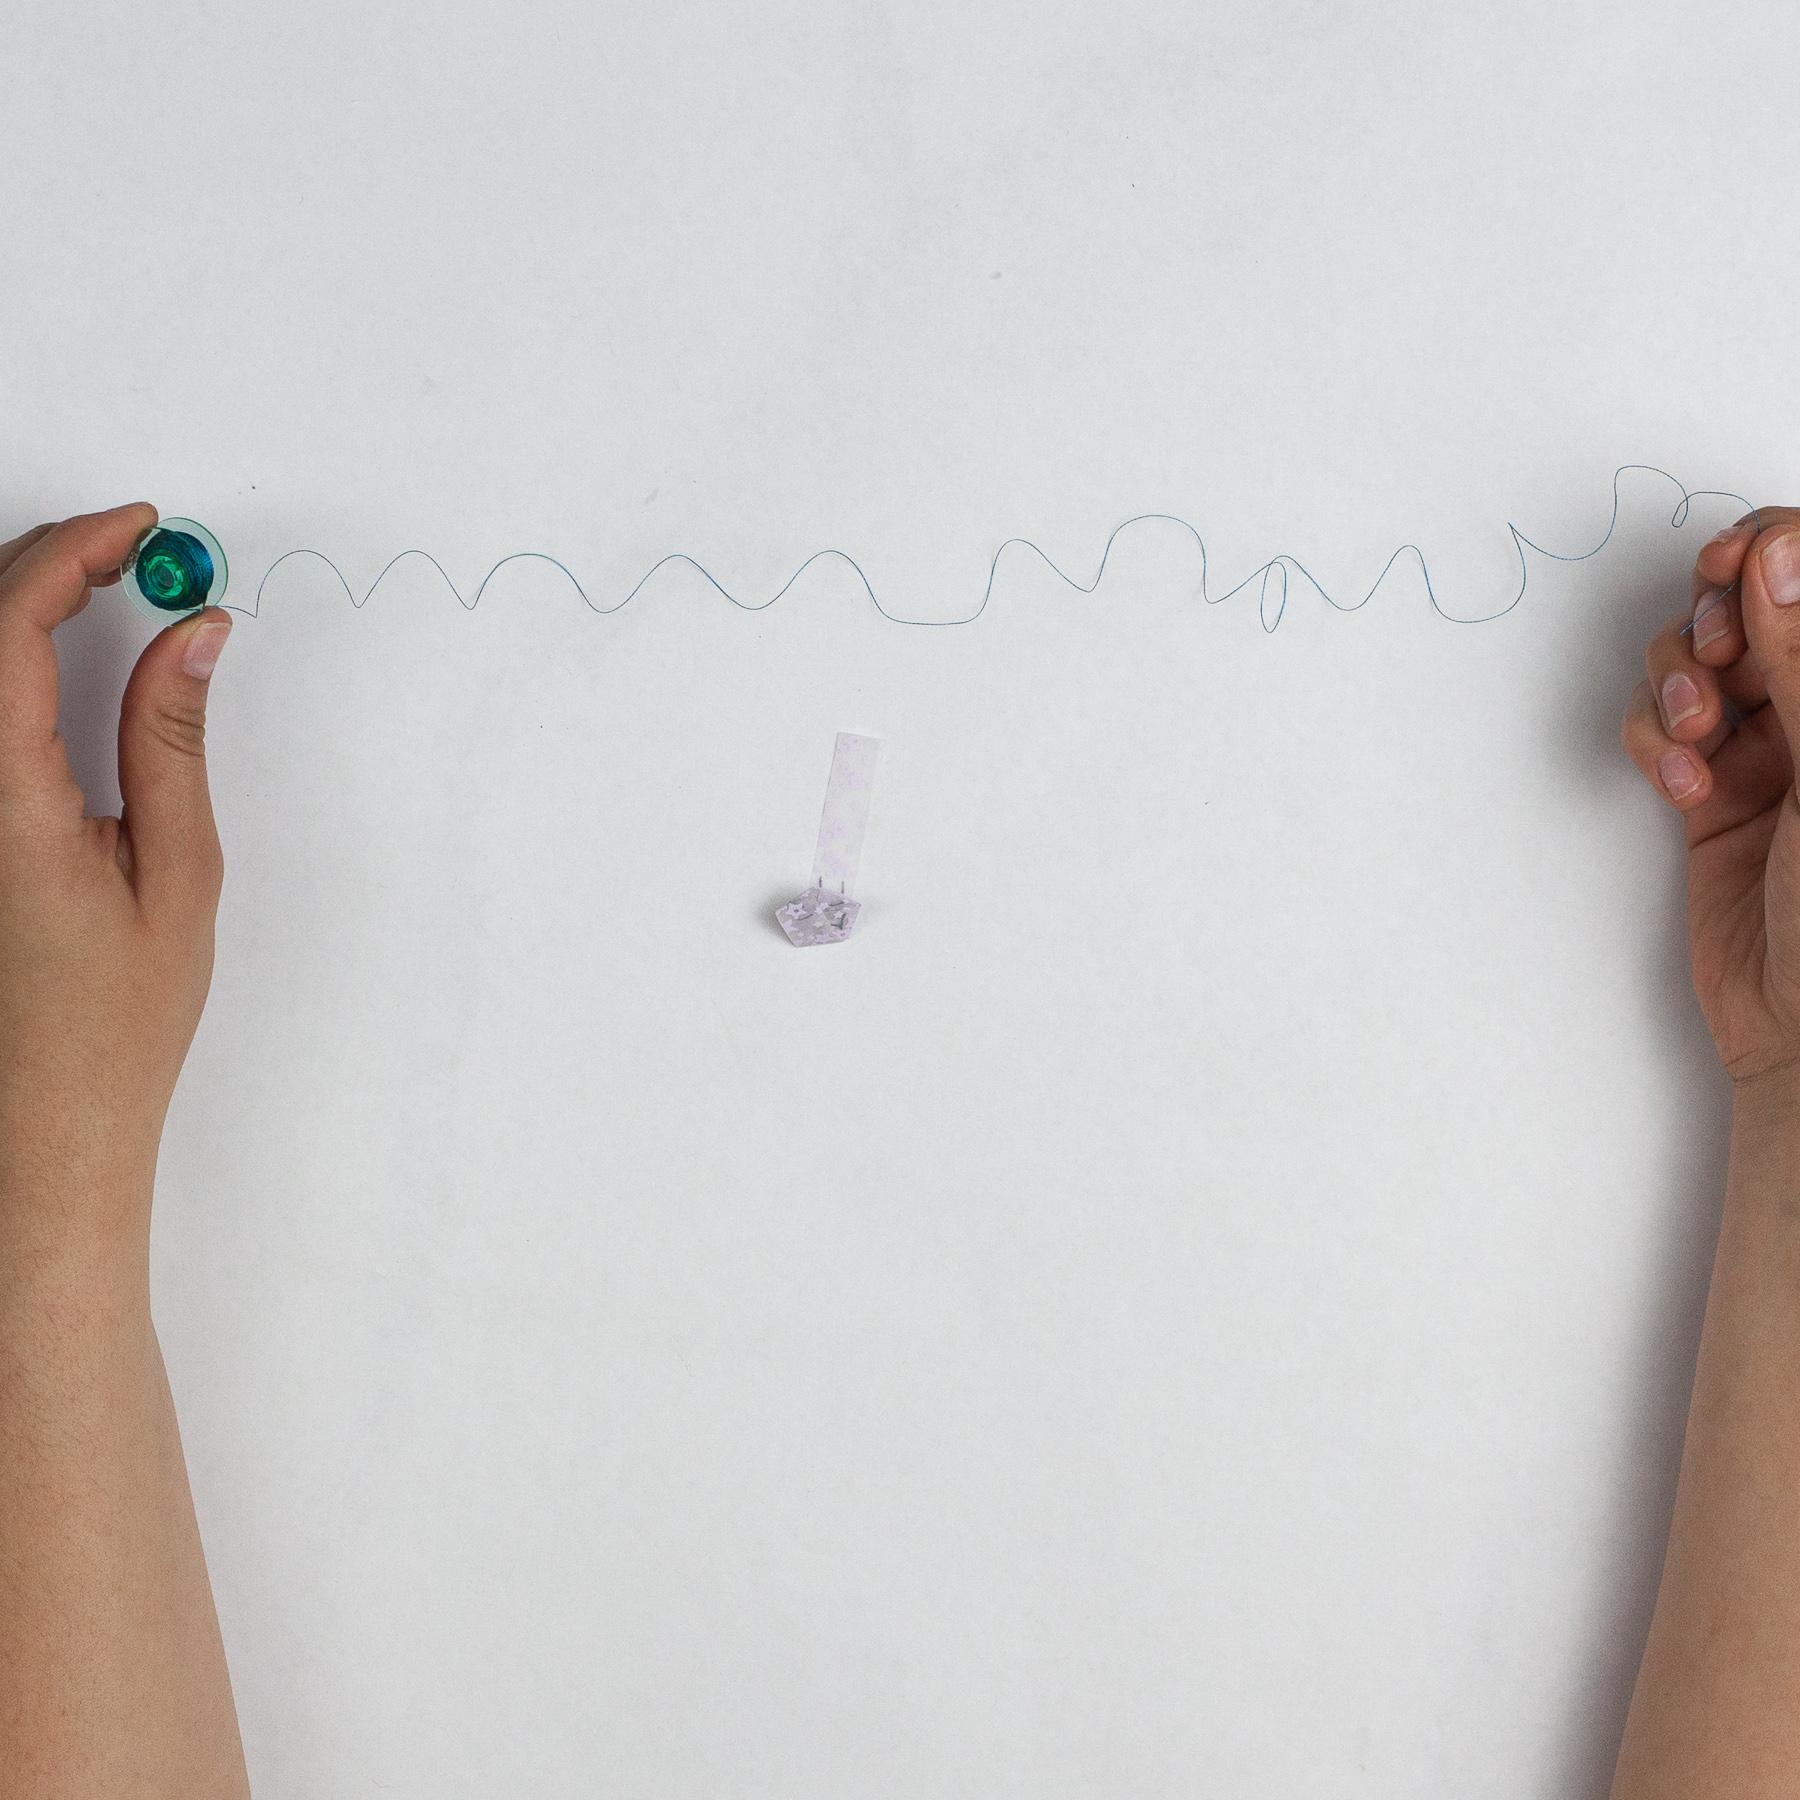 cut a long piece of thread